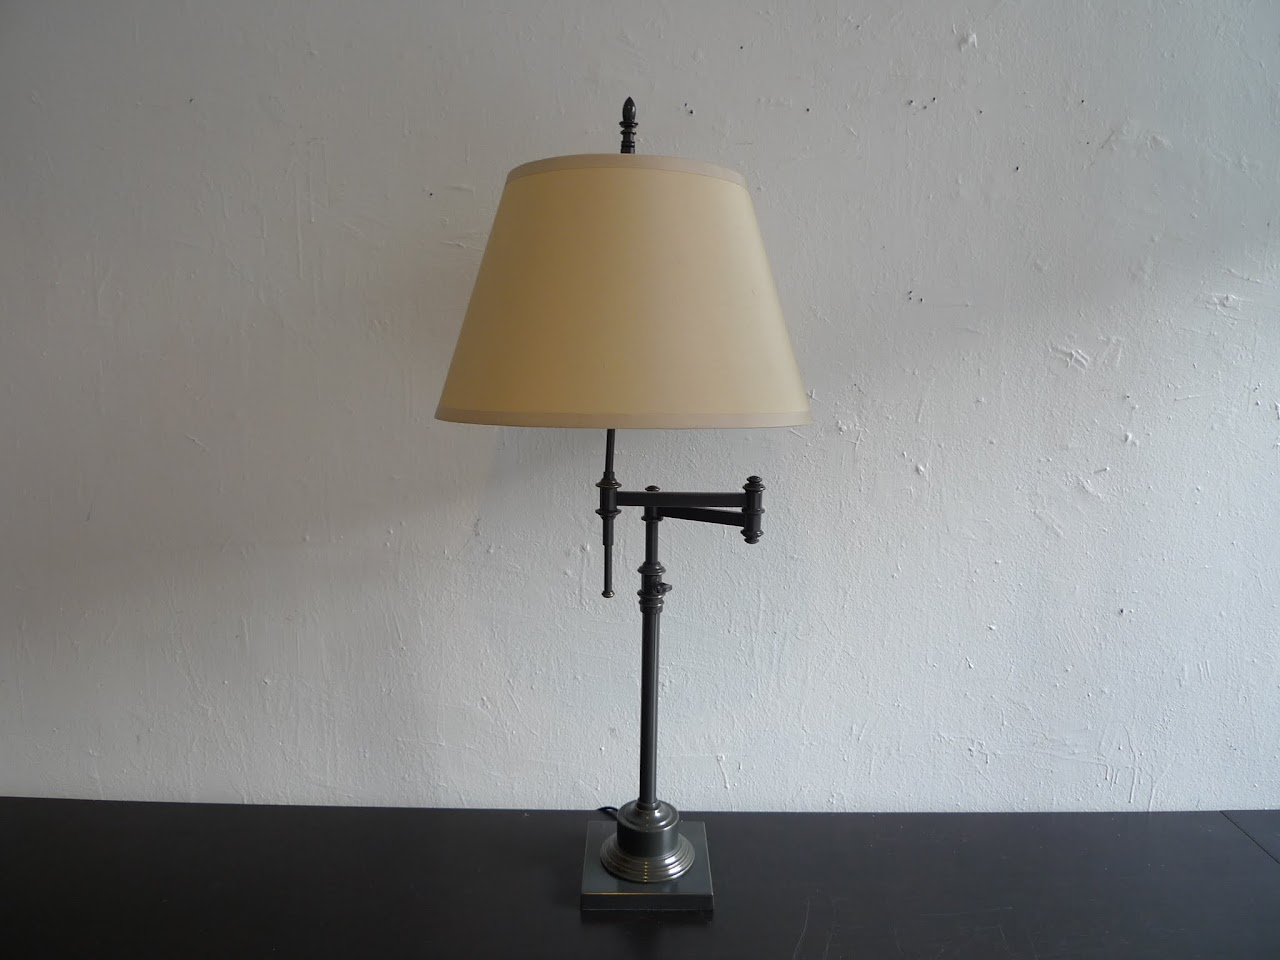 Restoration Hardware Swing Arm Table Lamp 2